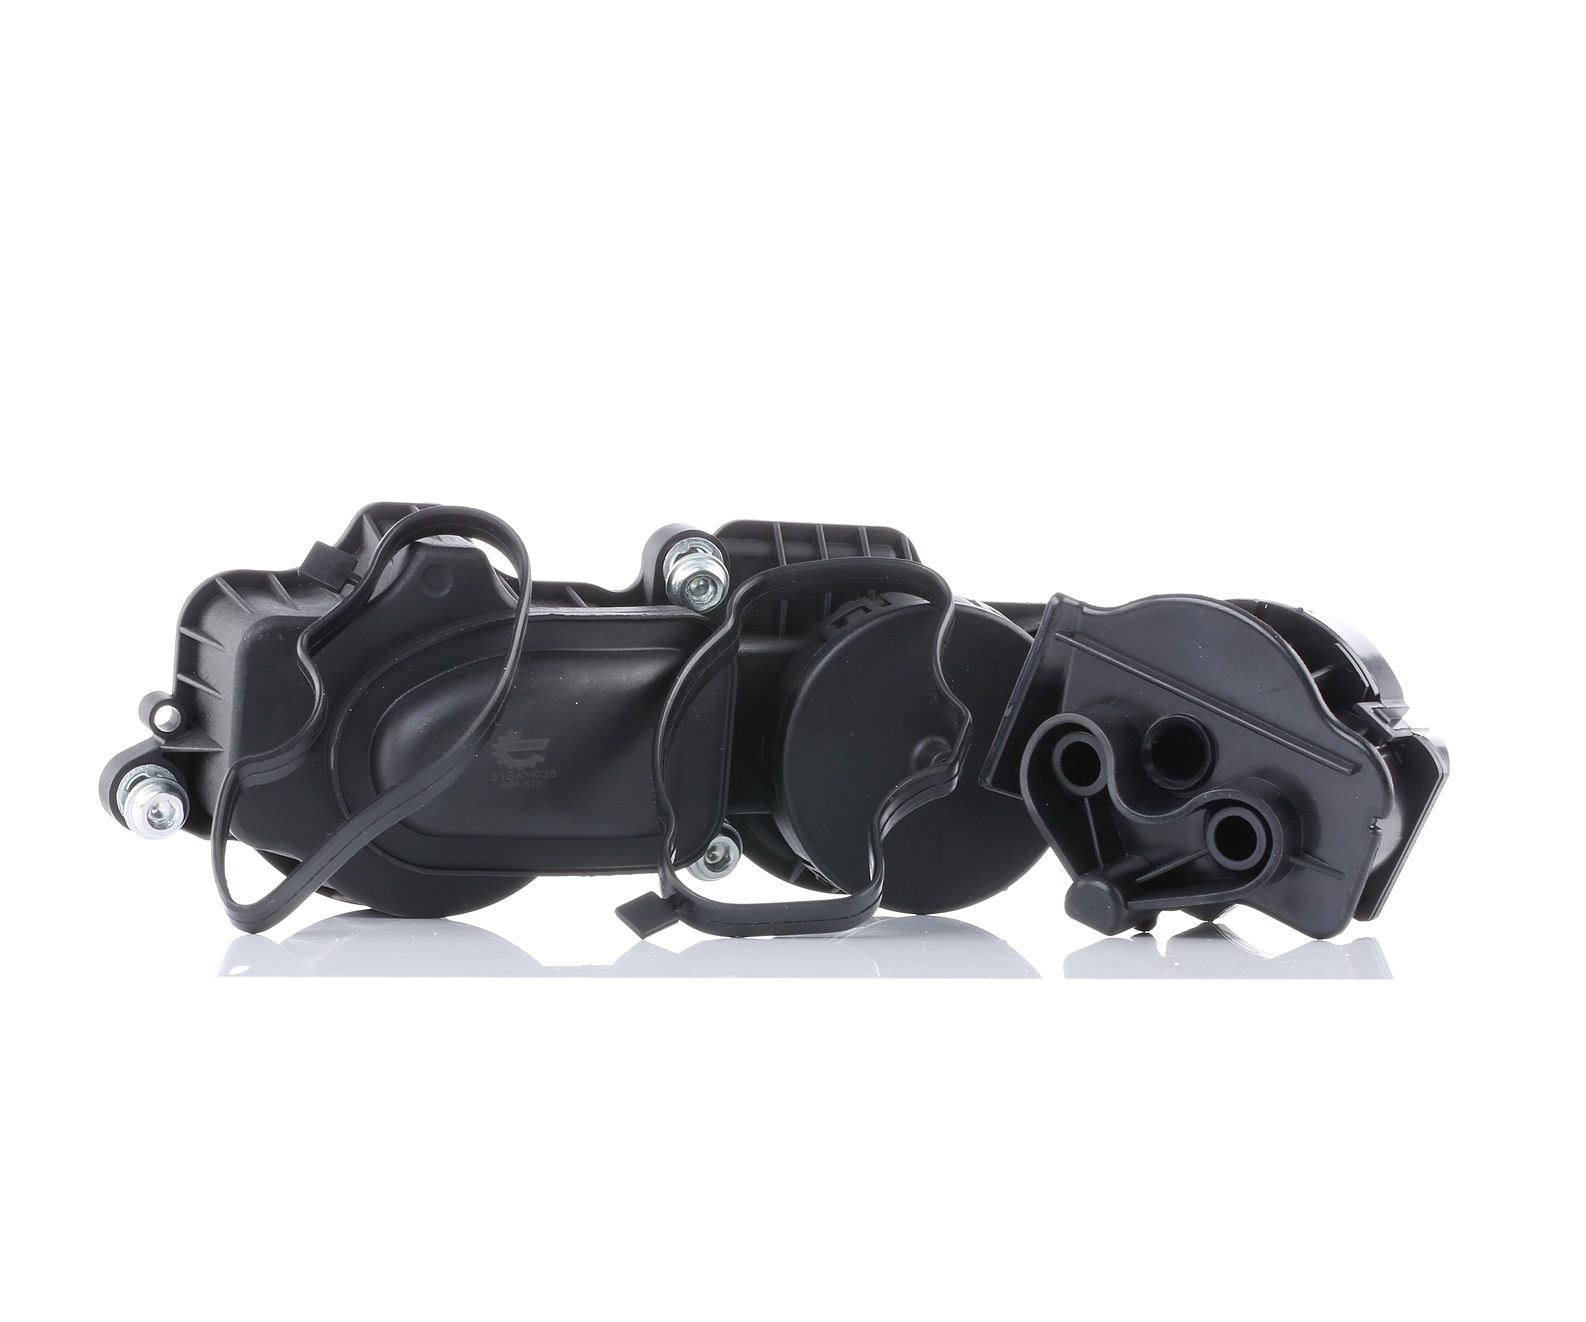 31SKV036 ESEN SKV Entlüftungsventil, Zylinderkopf druckgesteuert Ventil, Kurbelgehäuseentlüftung 31SKV036 günstig kaufen